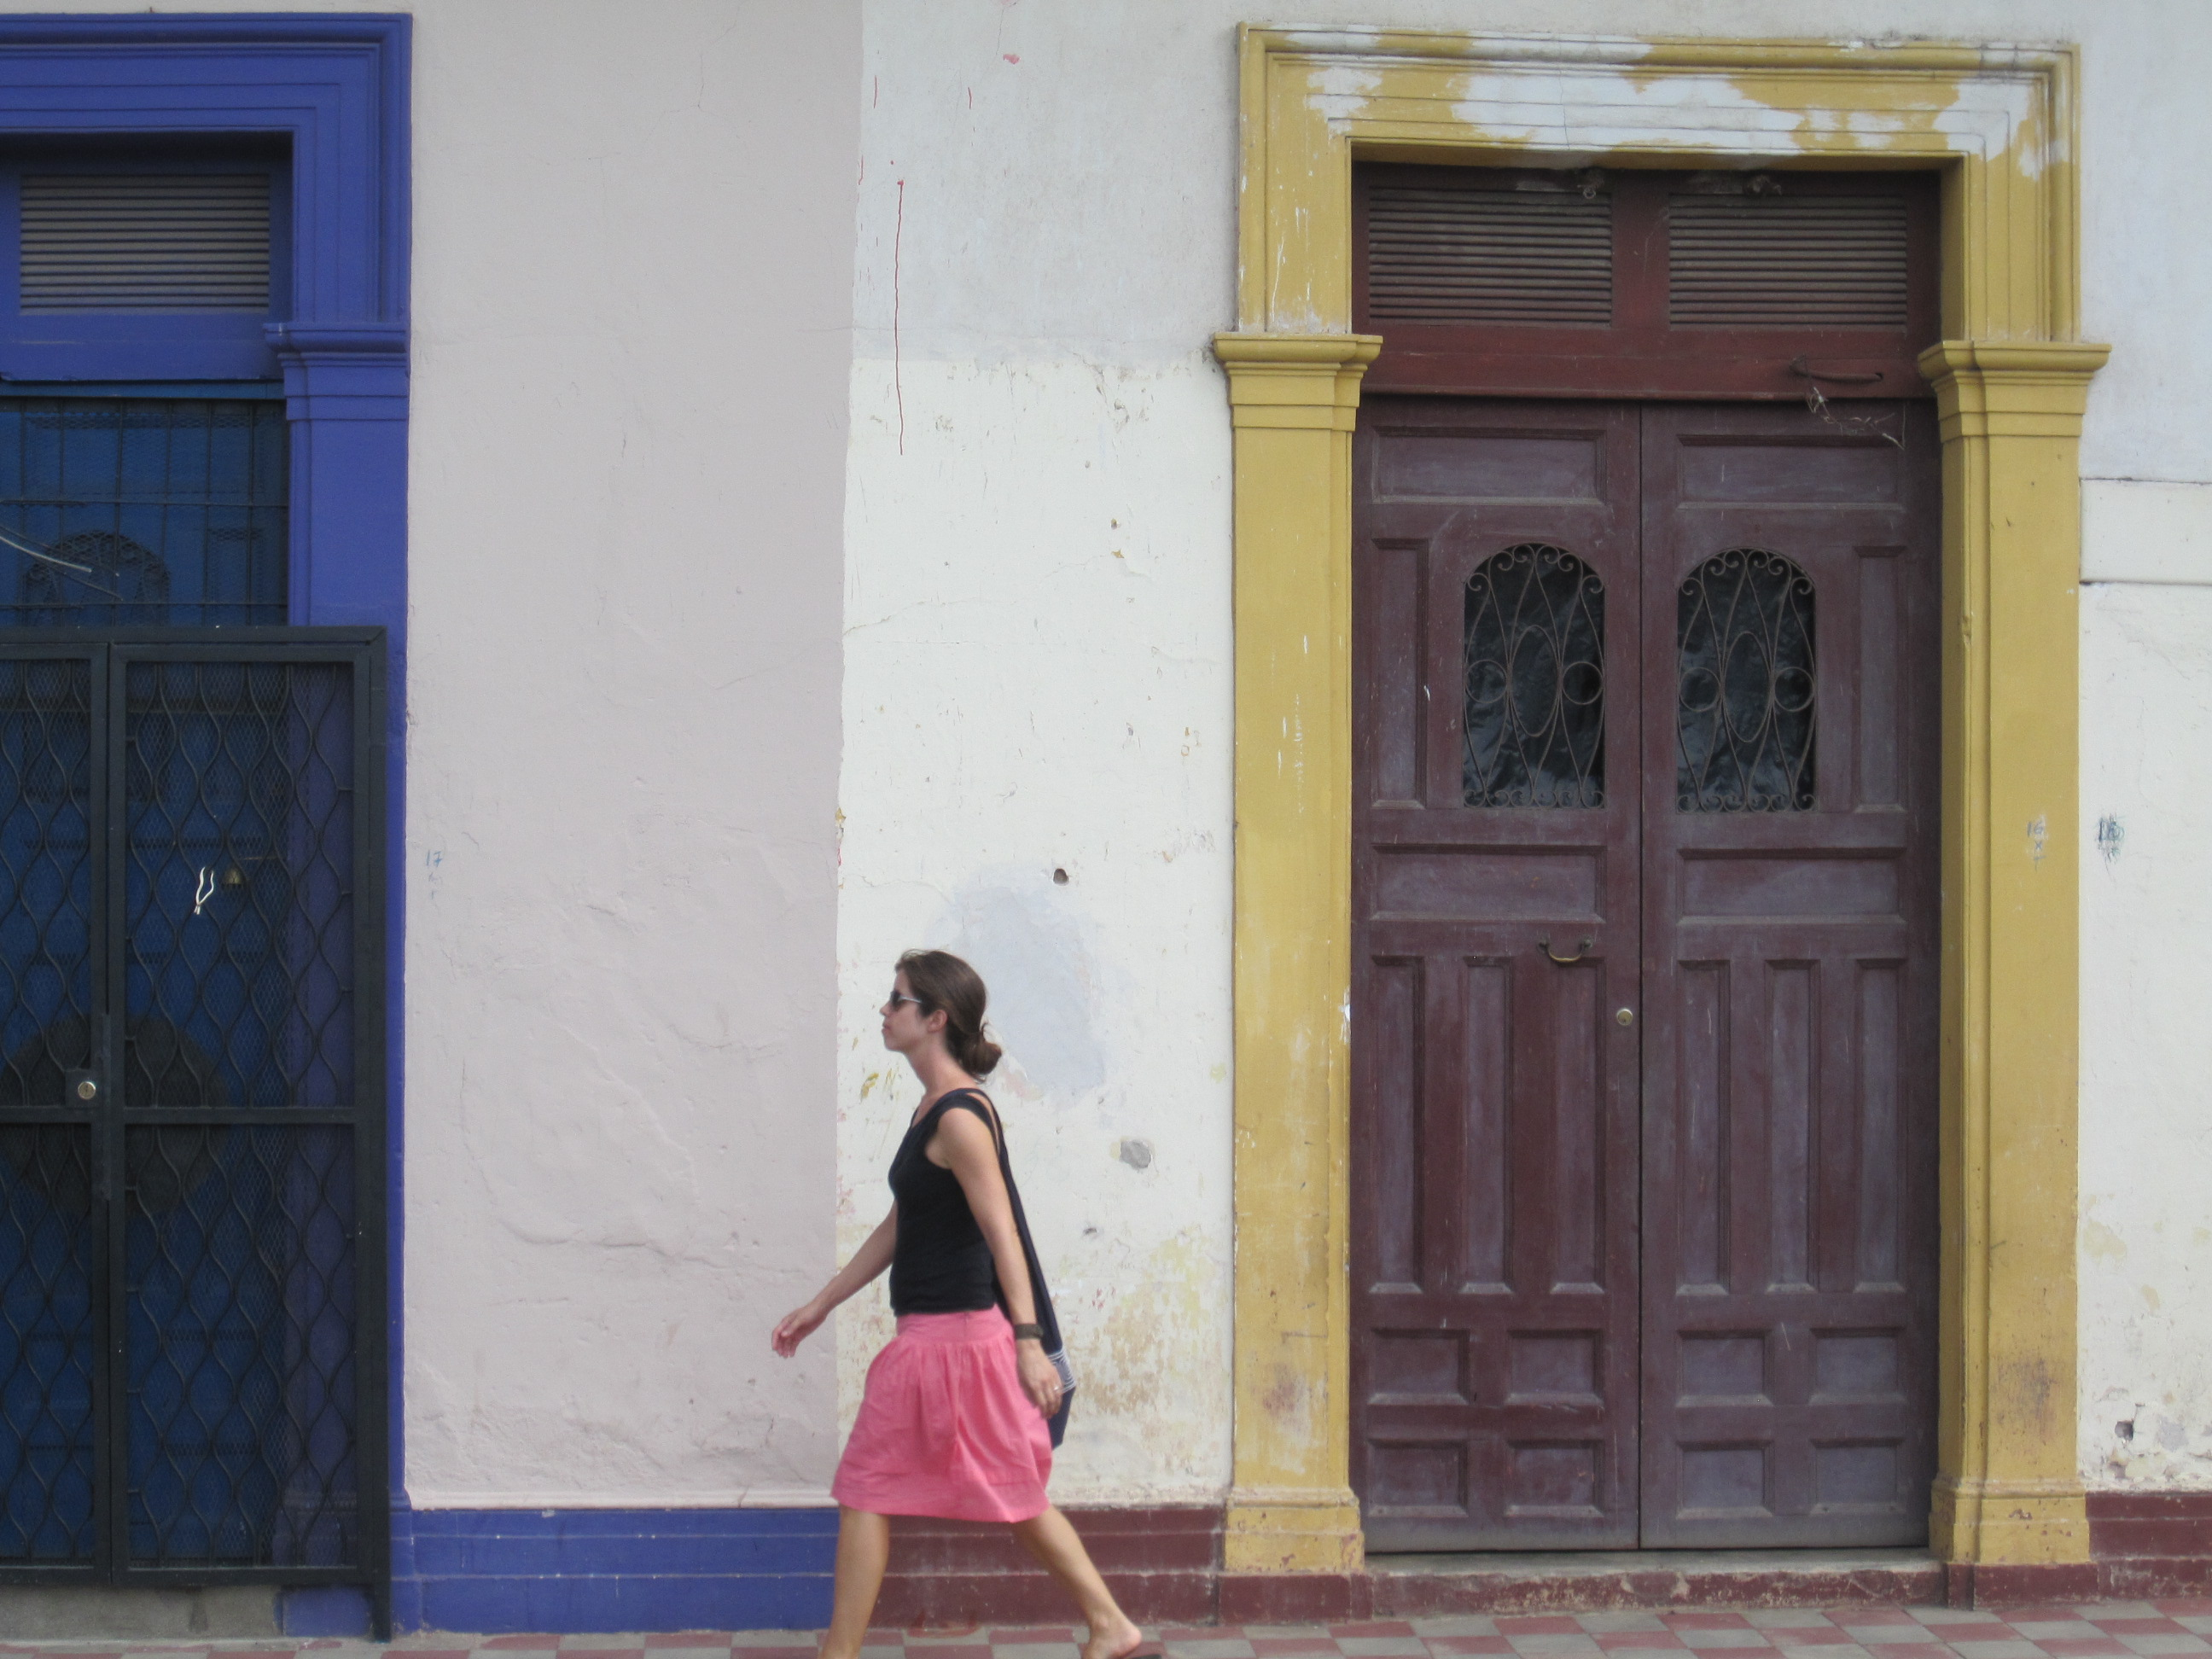 The Mean Streets of Granada